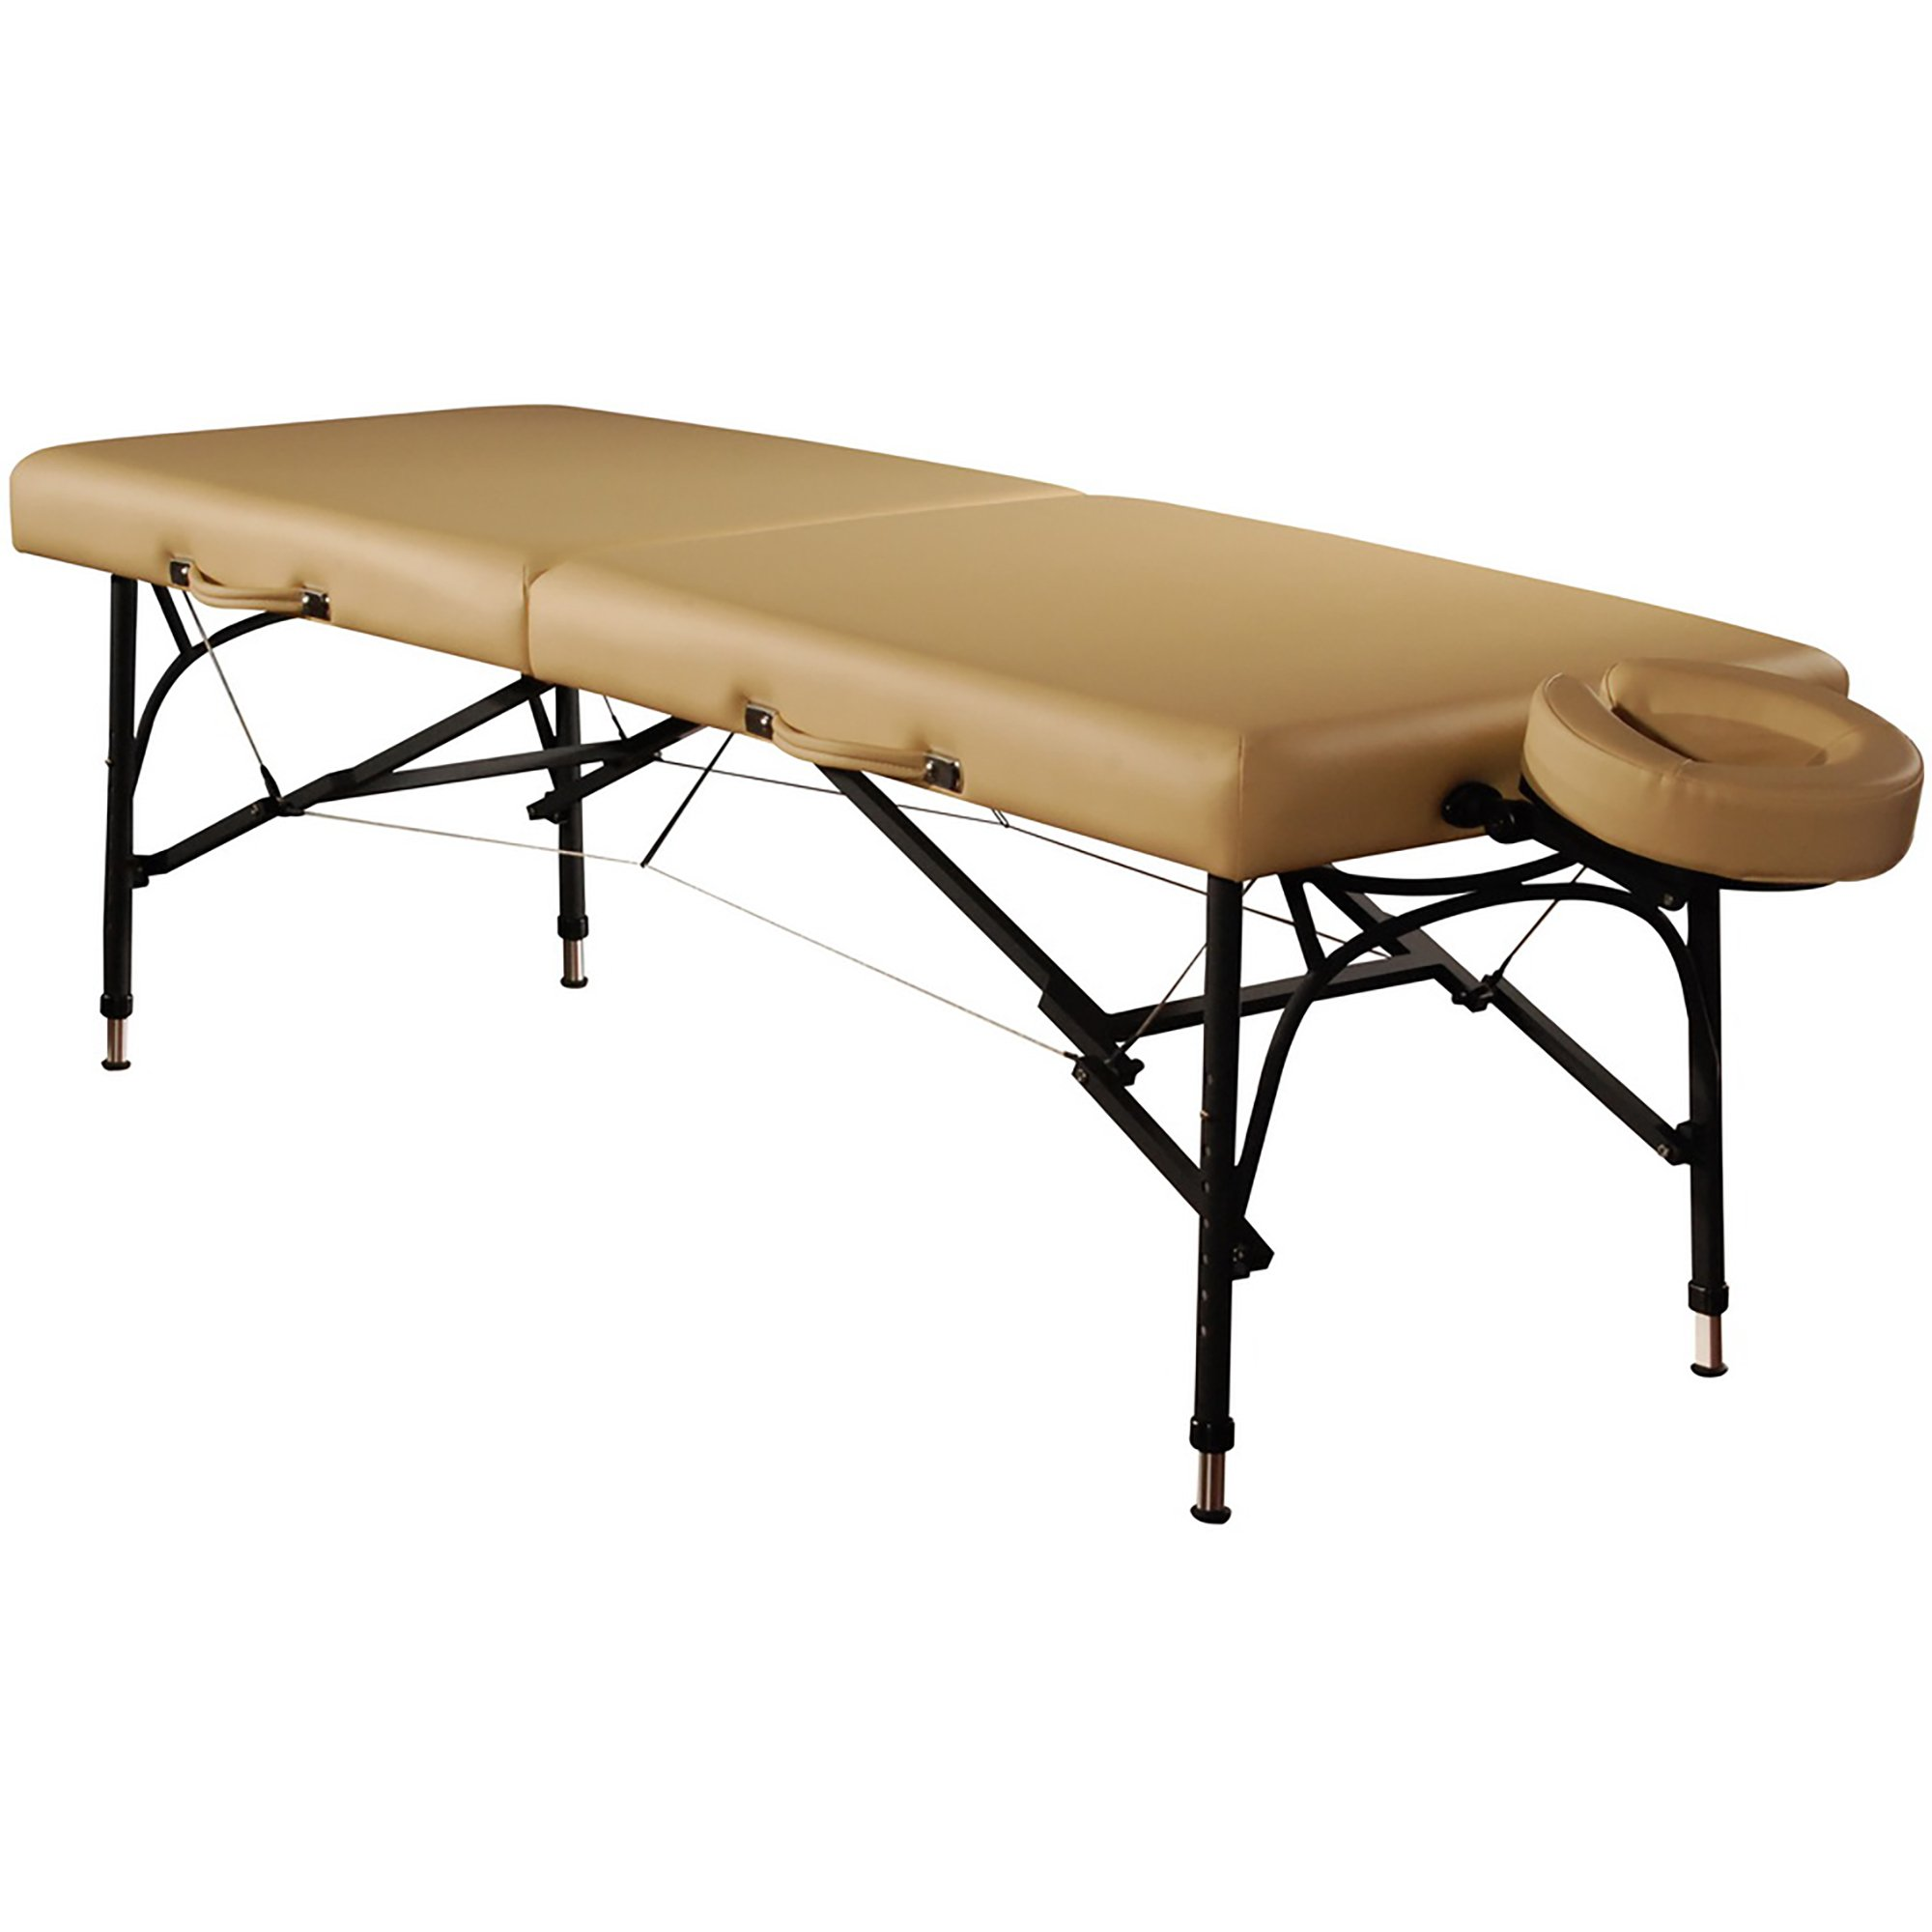 Mt Massage 28'' Violet Light Weight Aluminum Portable Massage Table Package(Beige)